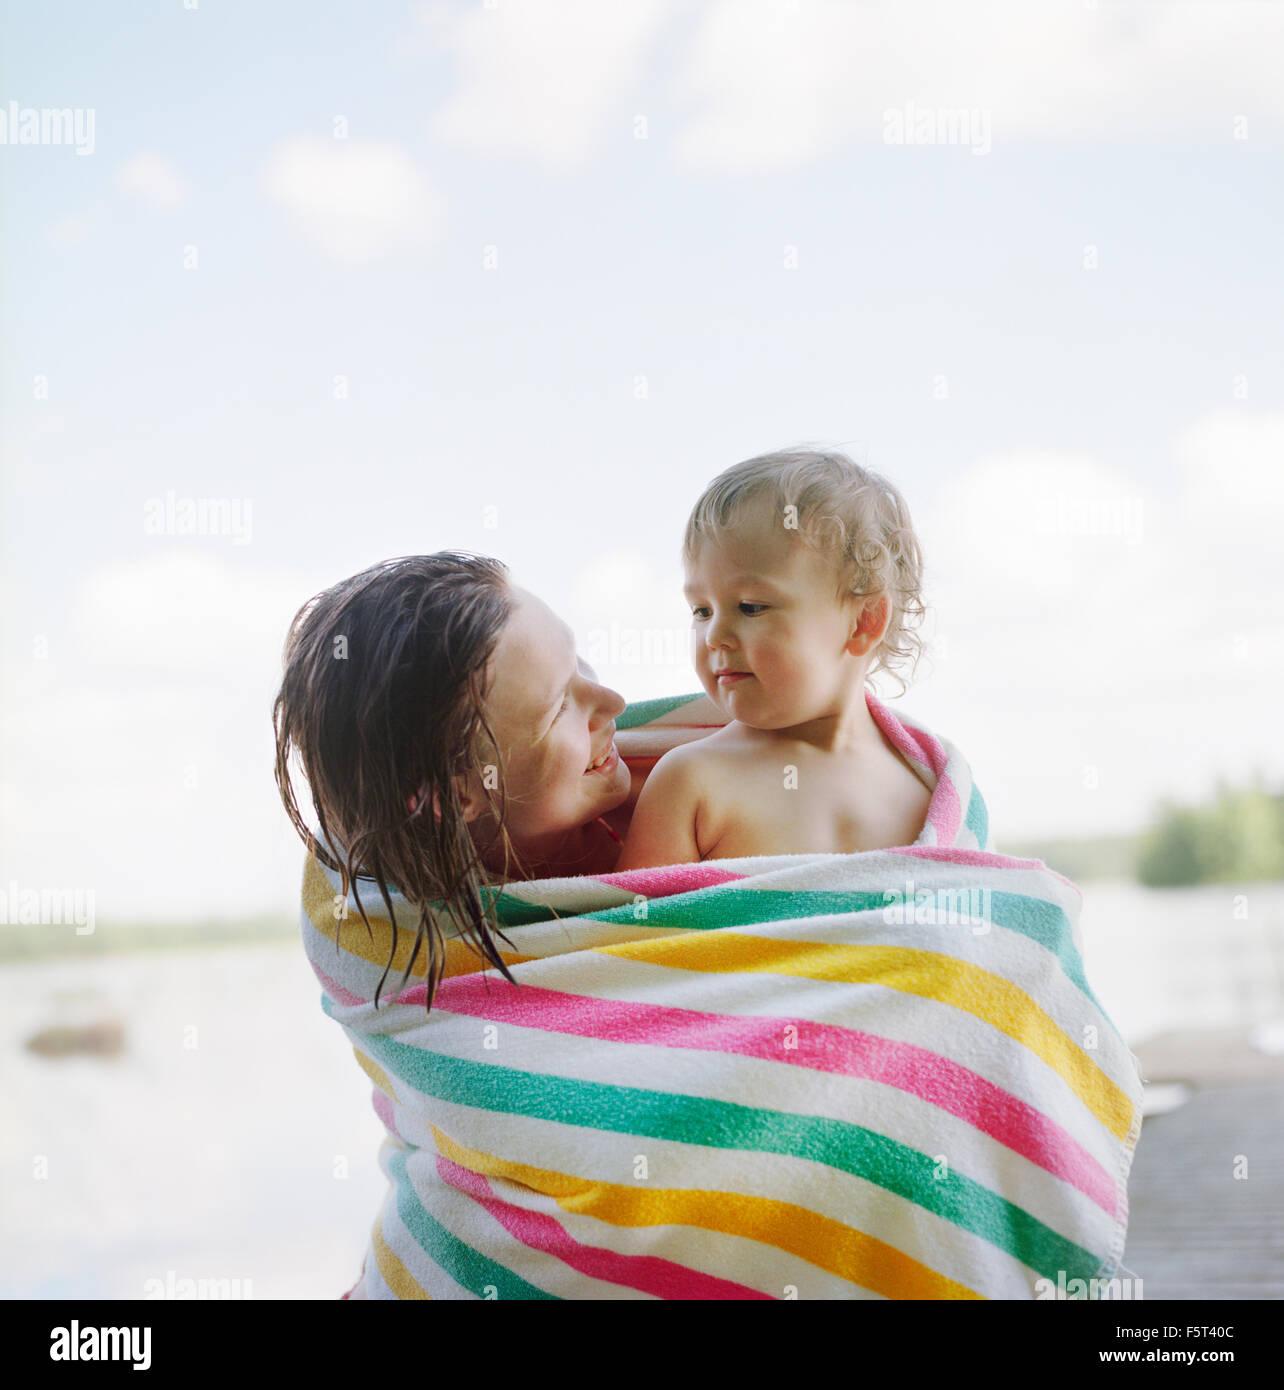 Finlandia, Uusimaa, Lapinjarvi, madre e hija (2-3) envuelto en toalla Imagen De Stock